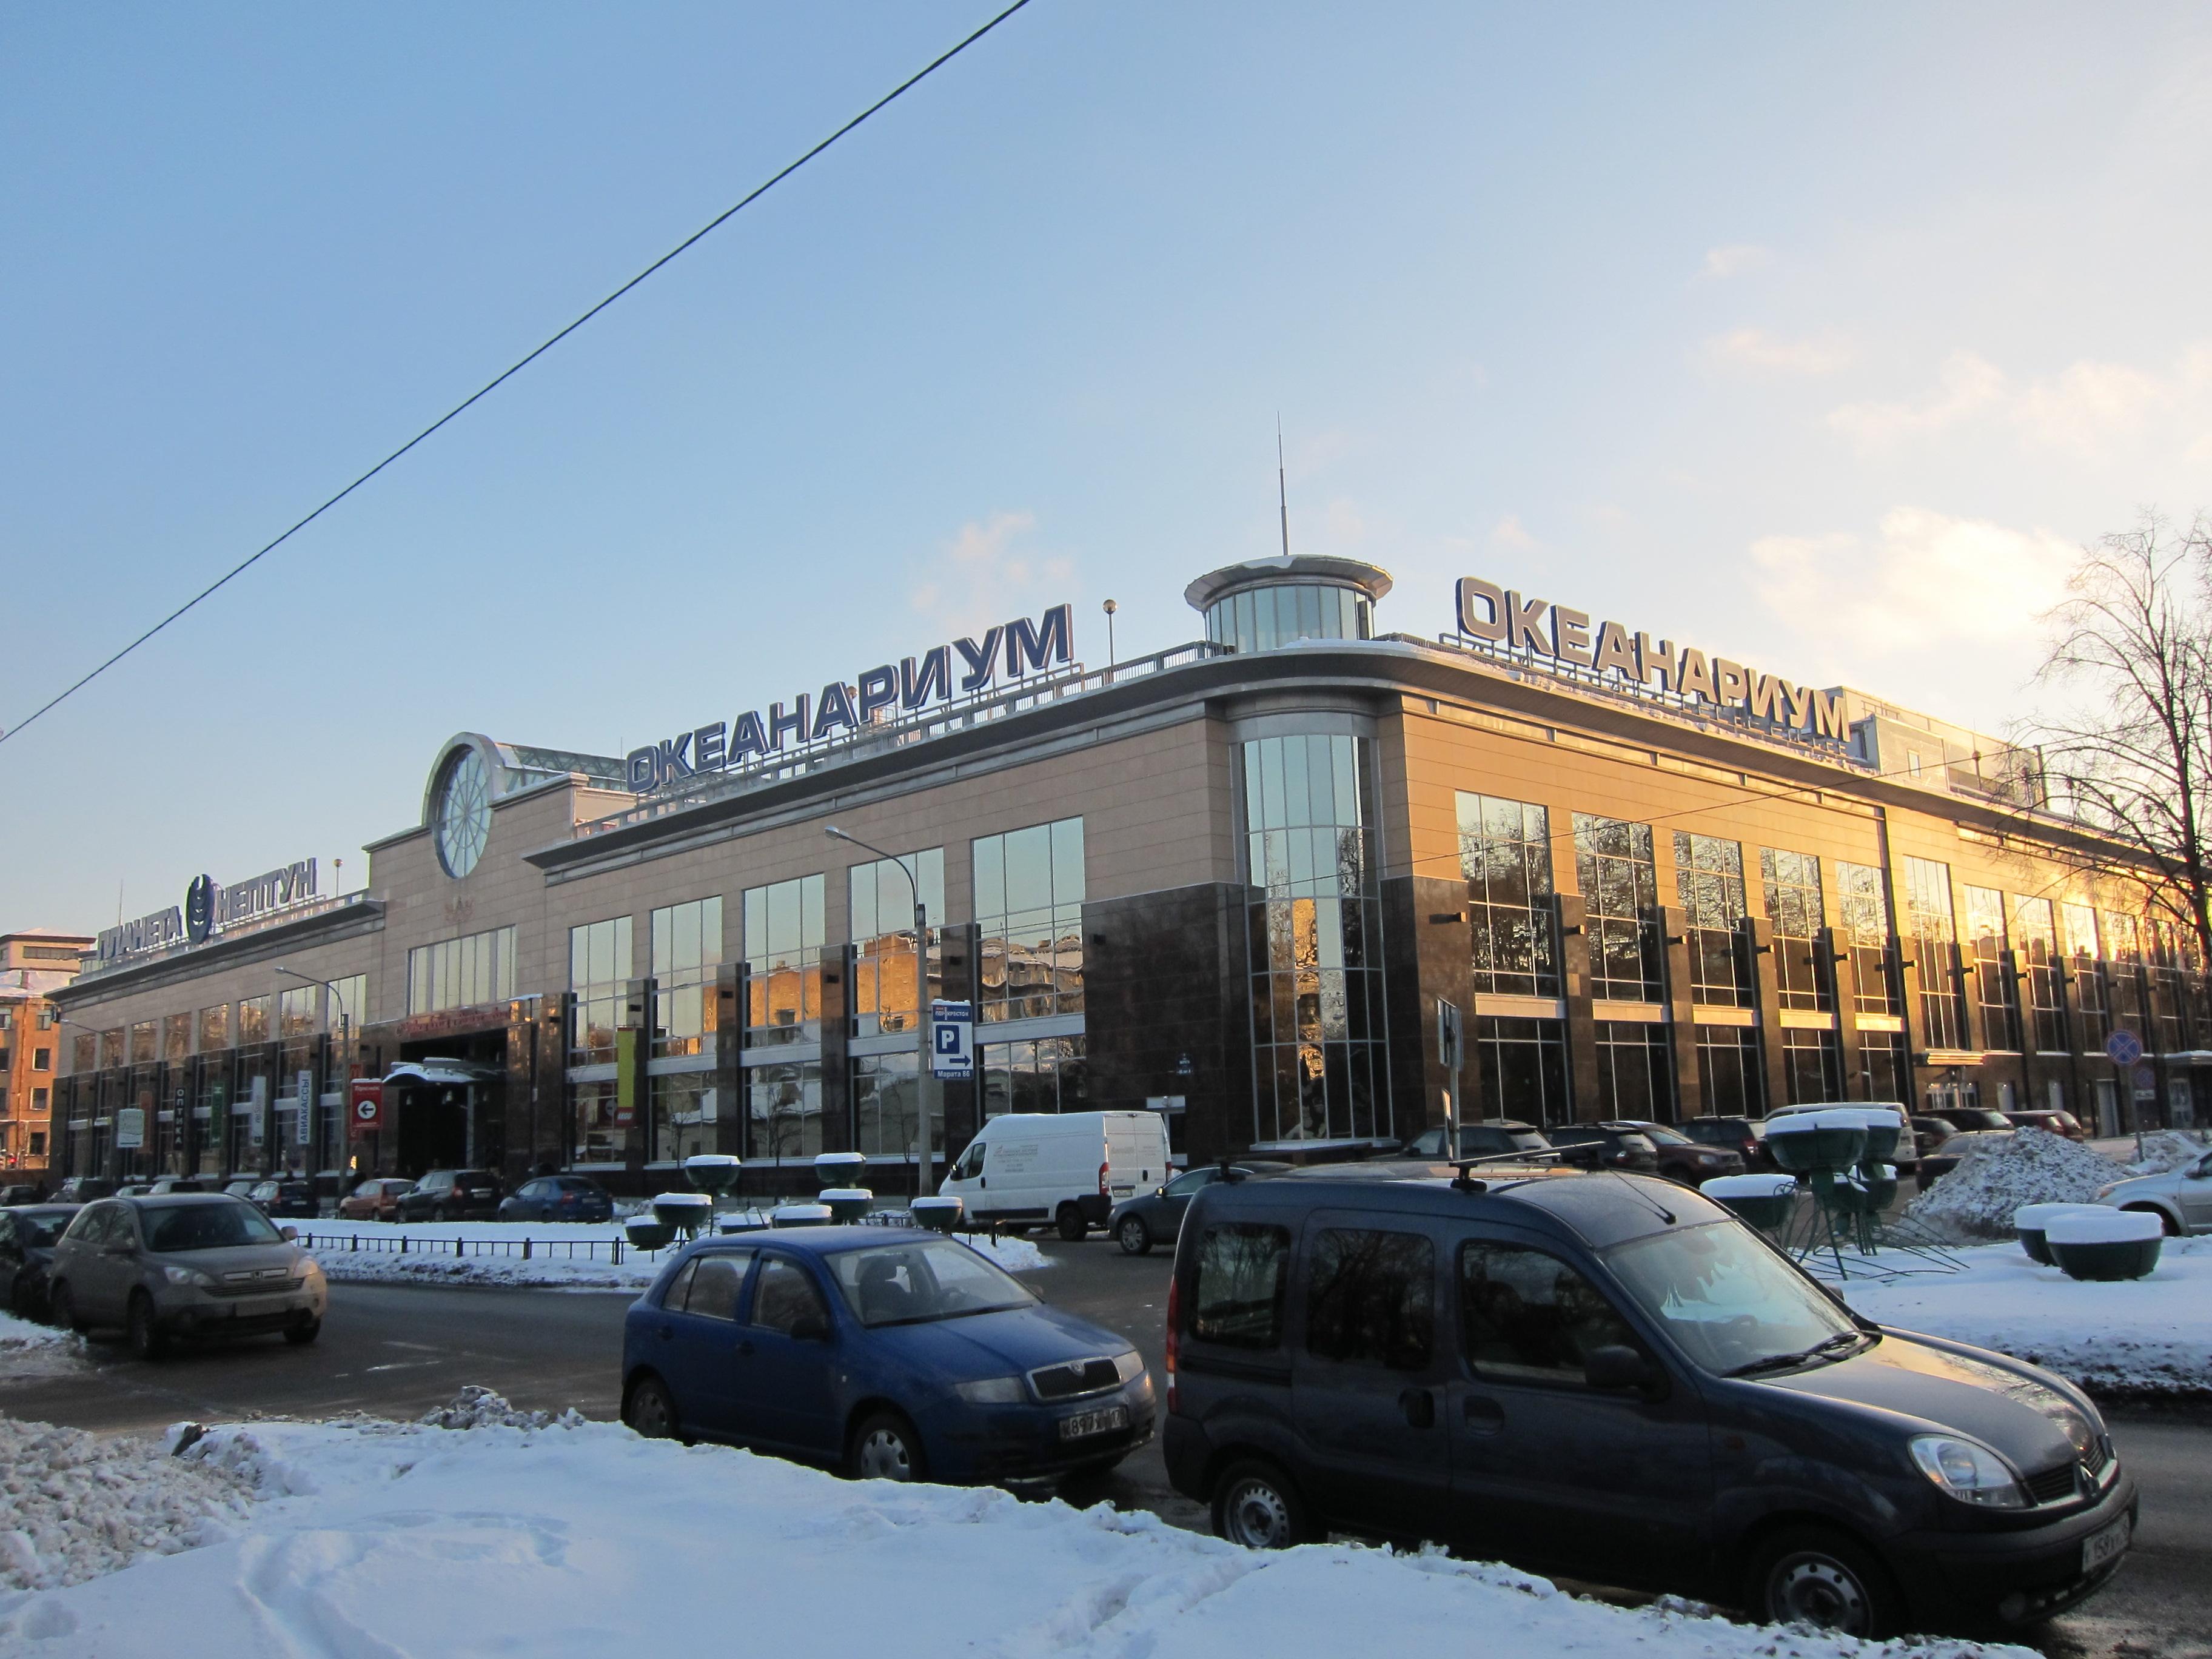 Oceanarium in St. Petersburg: address, photo, reviews 78